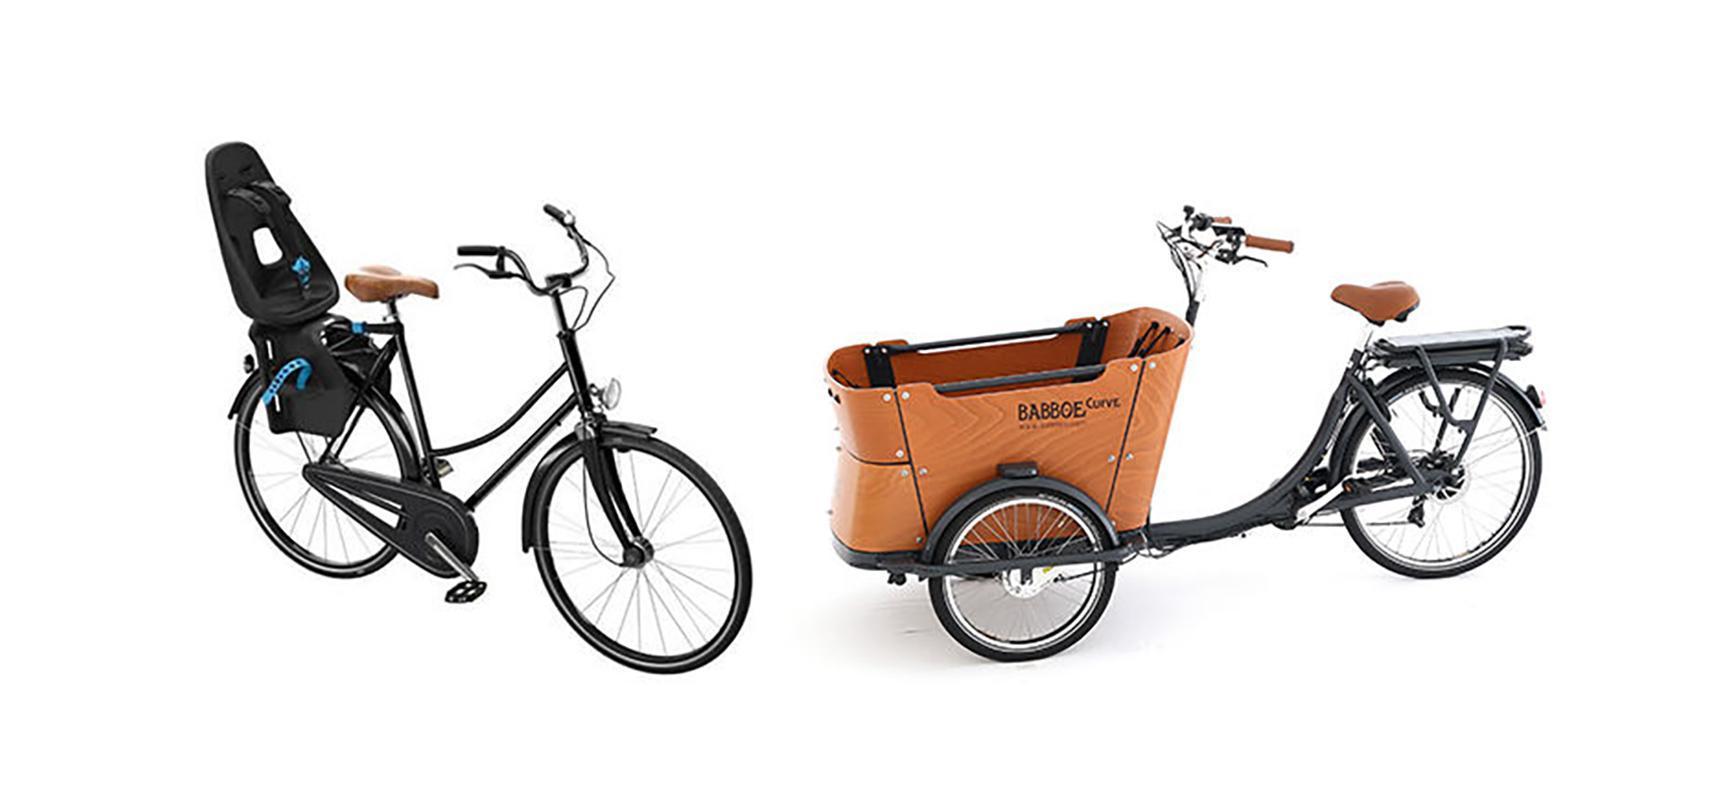 Vélo siège enfant